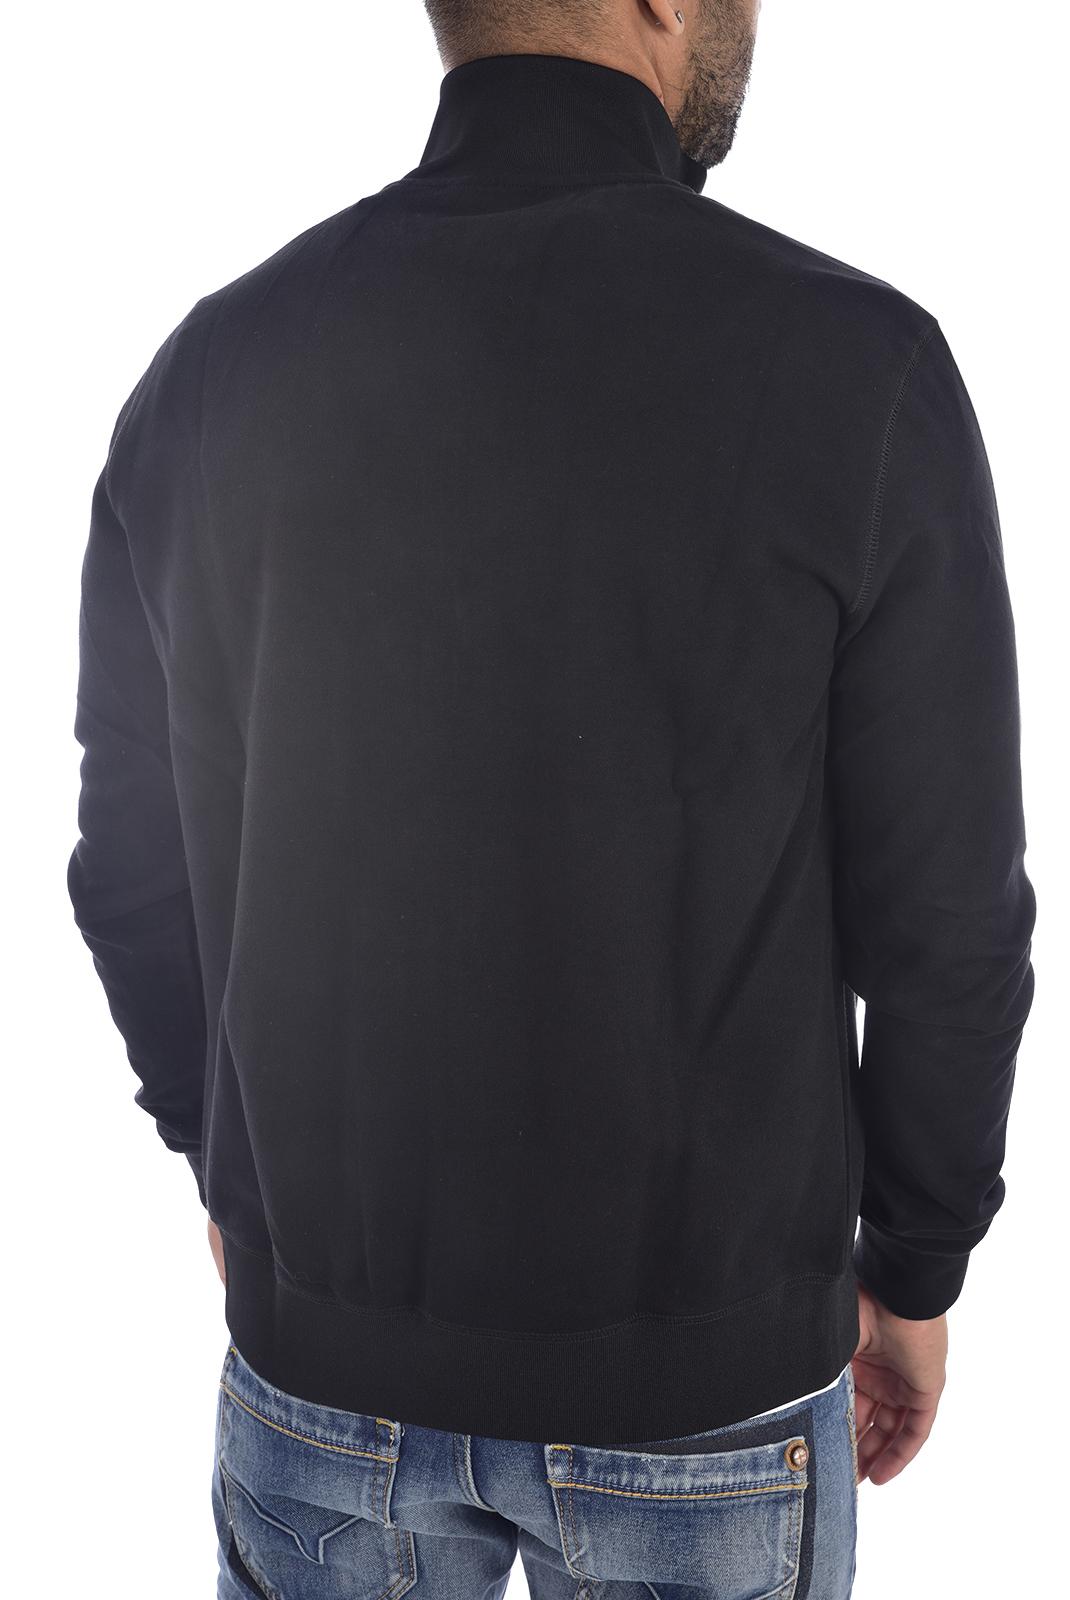 Vestes zippées  Kaporal OLYON BLACK